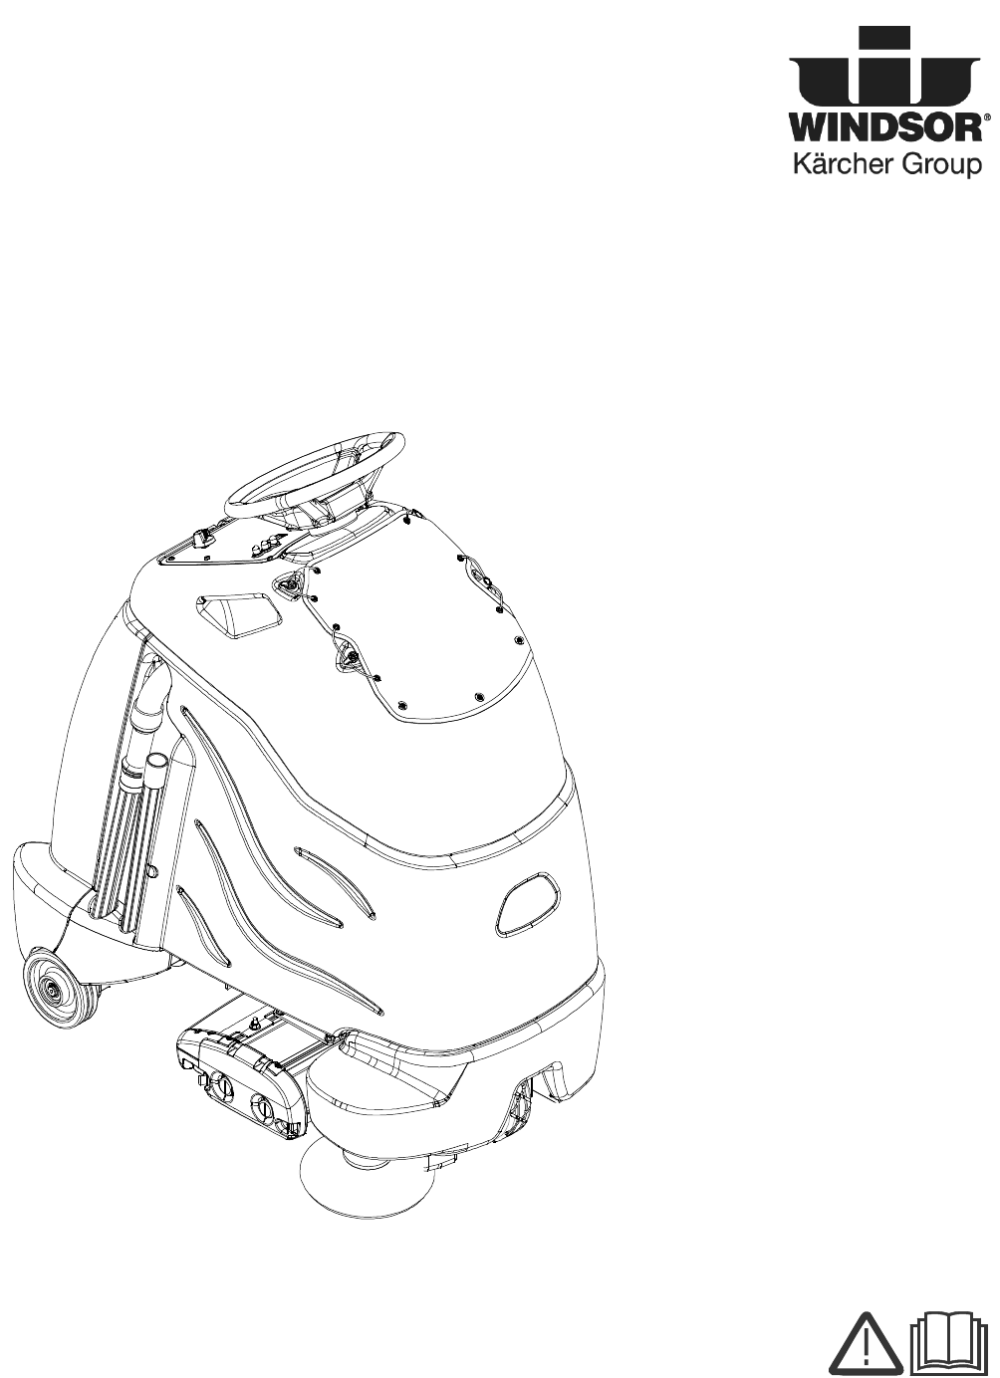 medium resolution of iring harn 240sx vacuum diagram browardcountymedicalassociation s13 sr20 vacuum diagram iring harn 240sx vacuum diagram